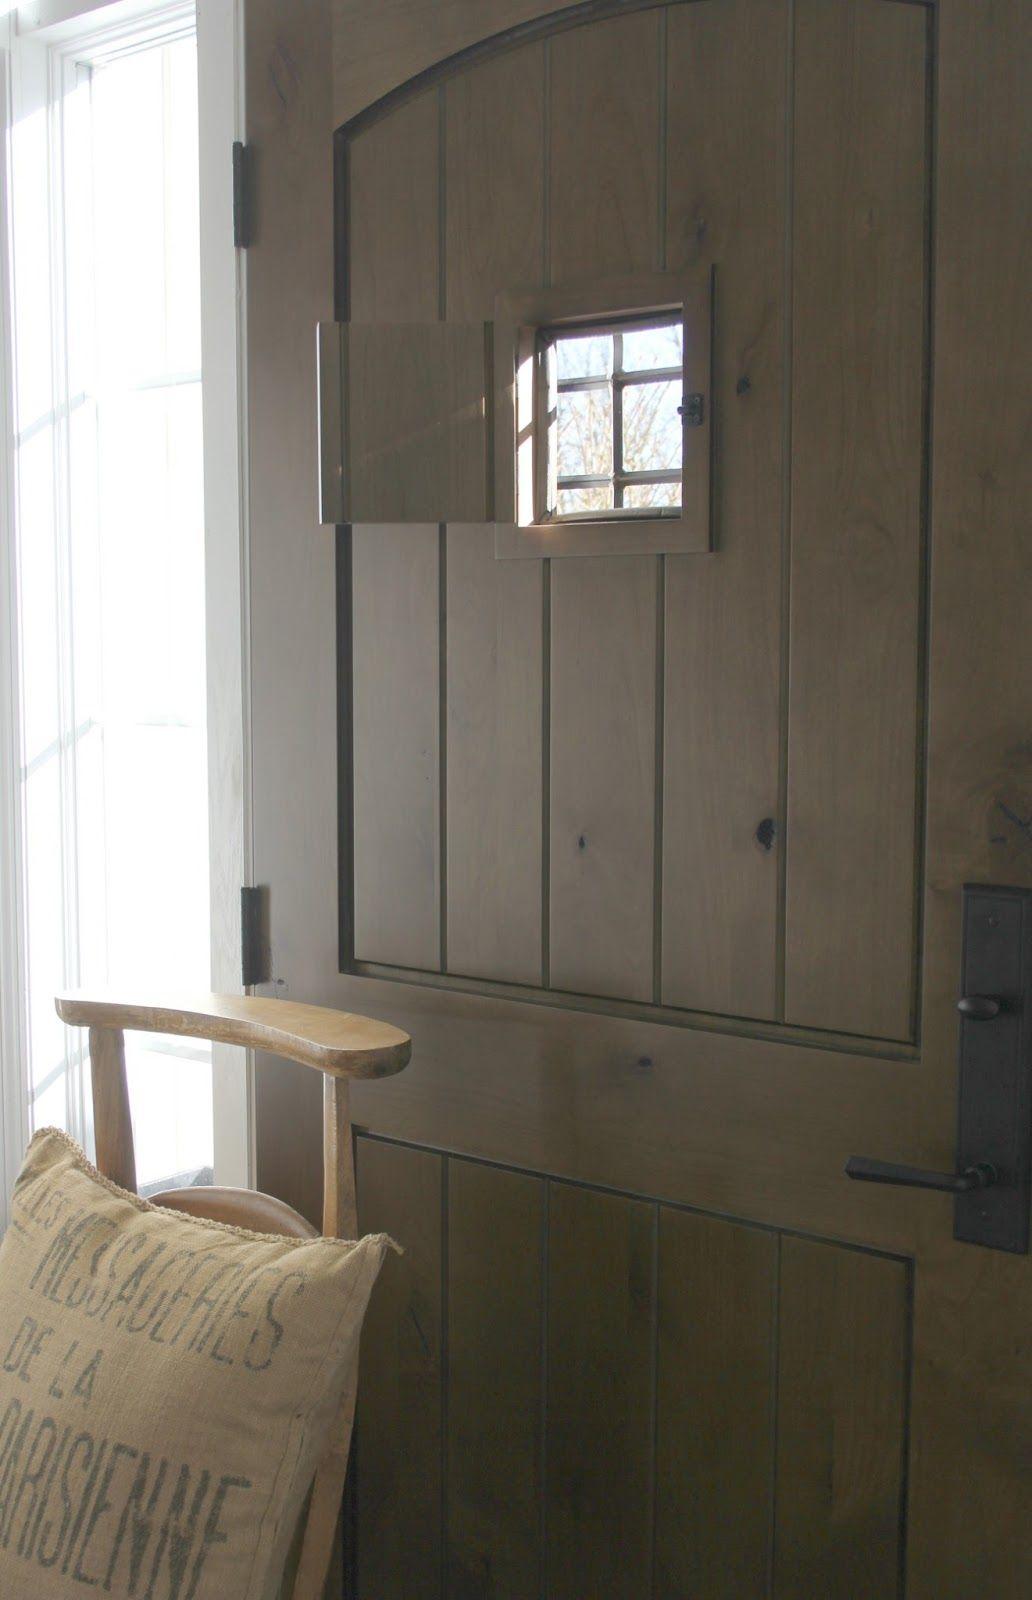 Rustic Knotty Alder Exterior Door With Walnut Finish, Operable Speakeasy,  Clavos, And Bronze